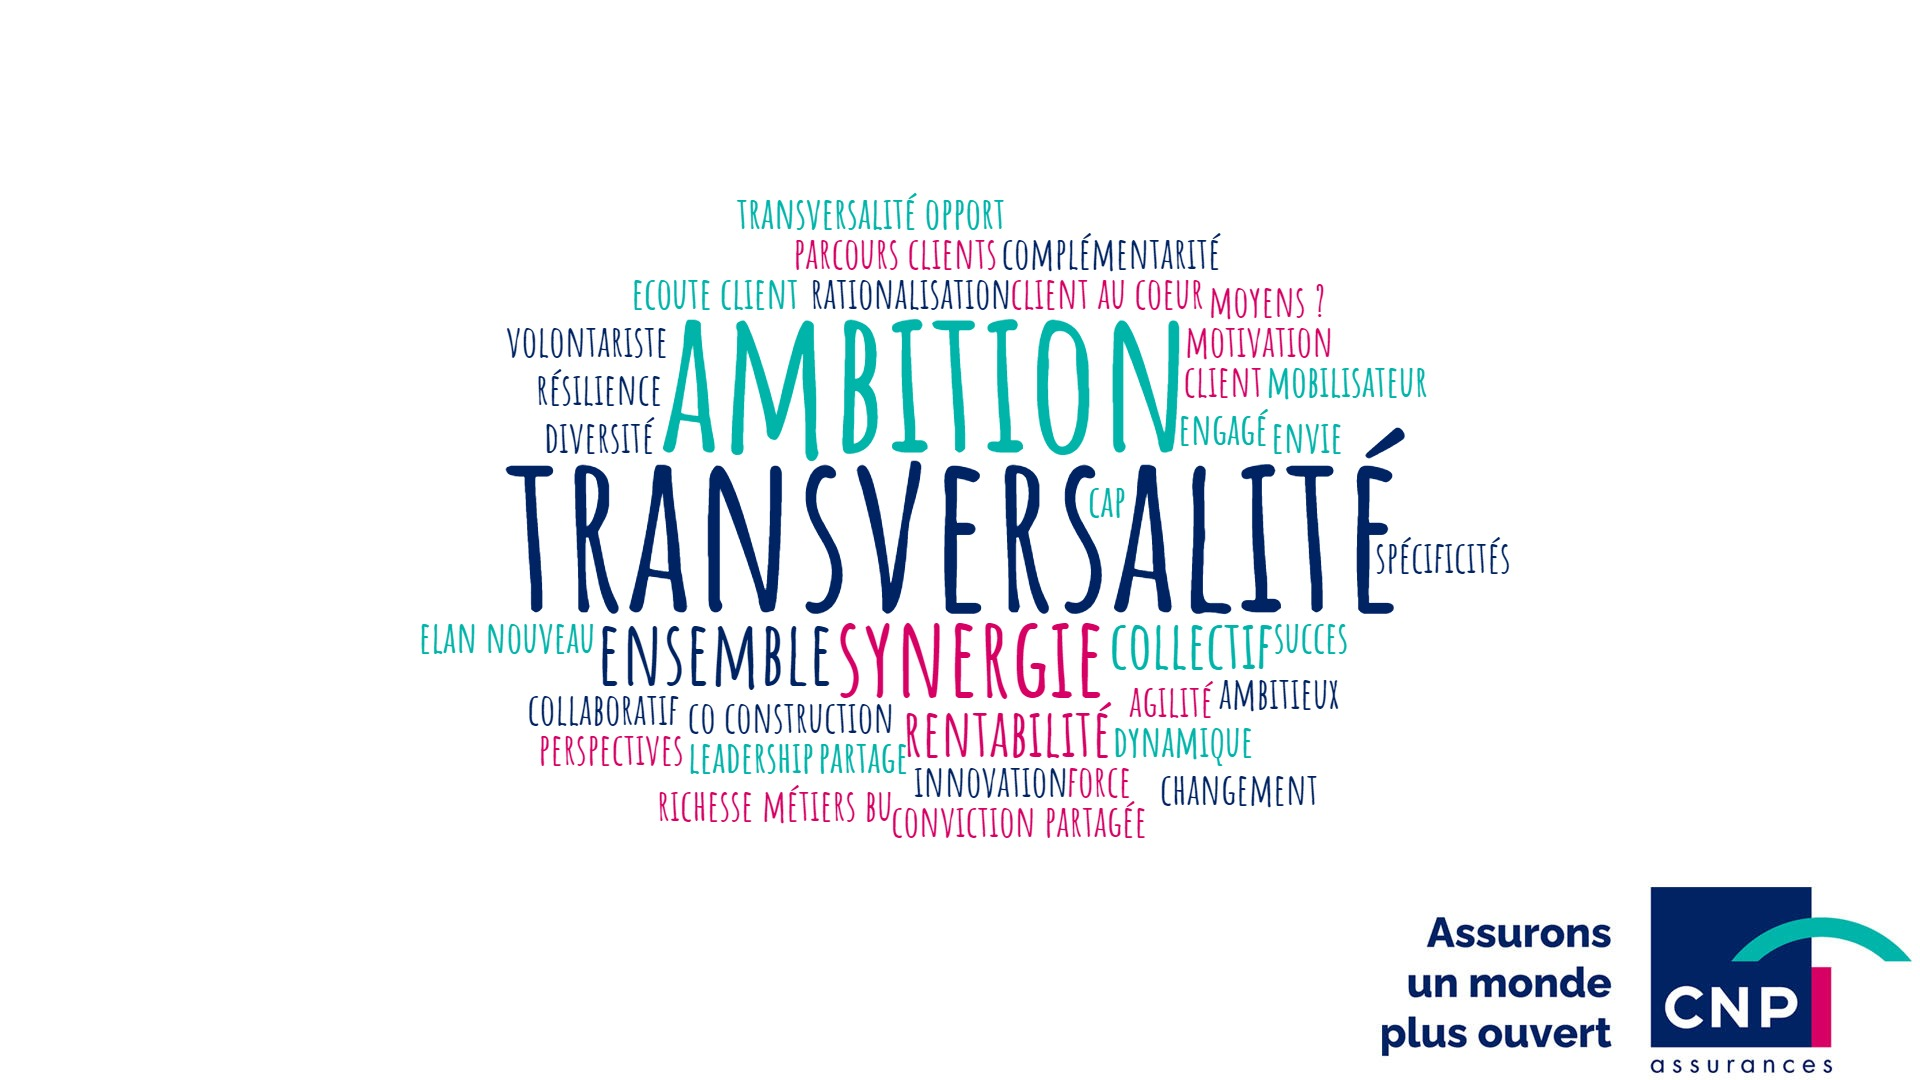 Animation visioconférence séminaire CNP